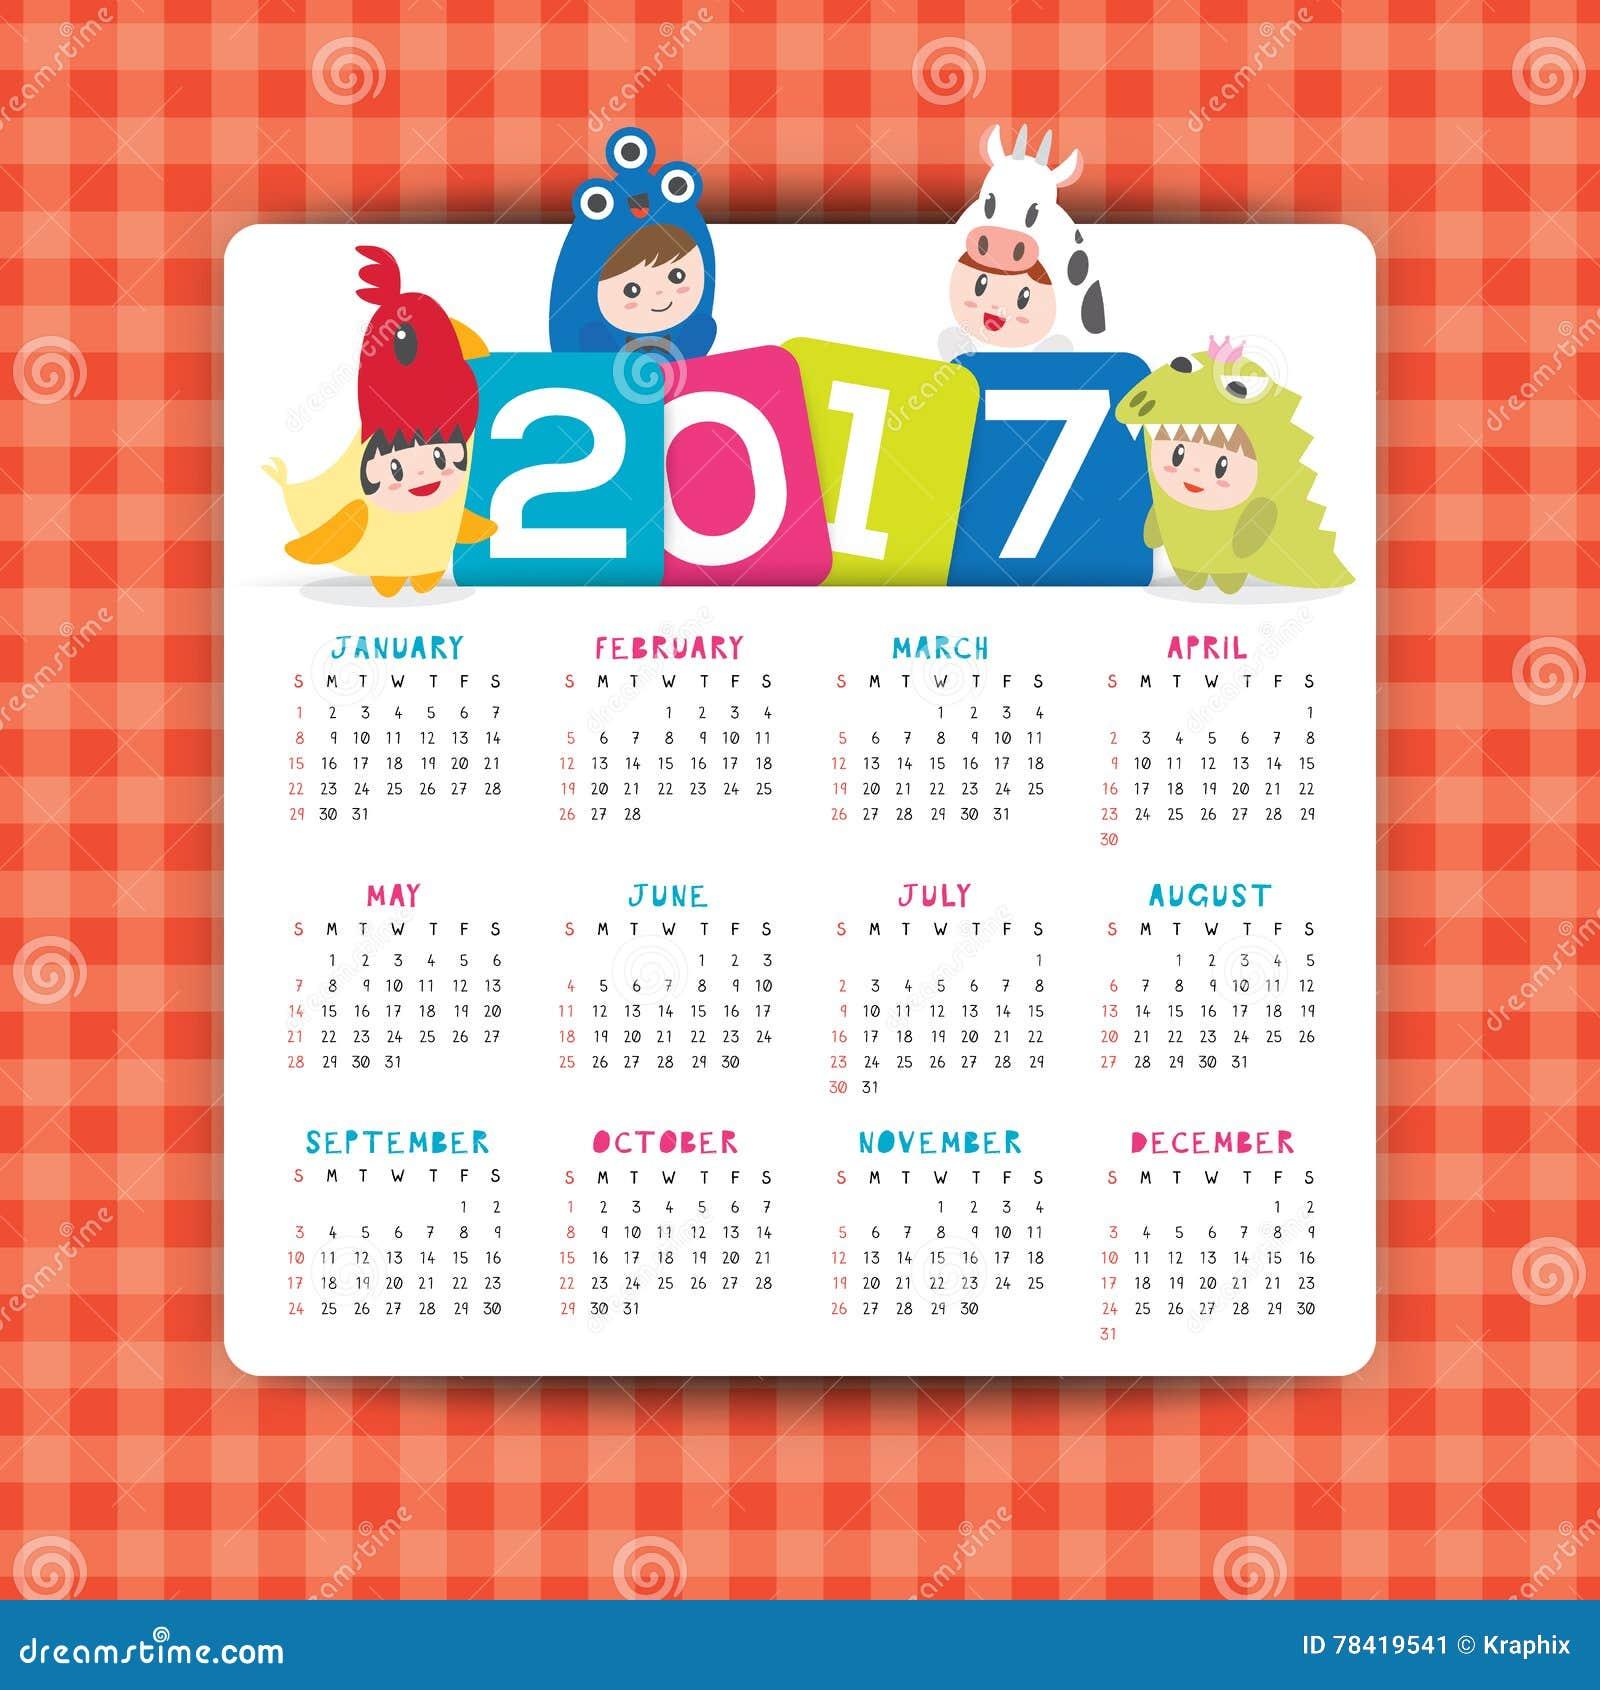 Weekly Calendar Cartoon : Calendar vector template with kids cartoon character